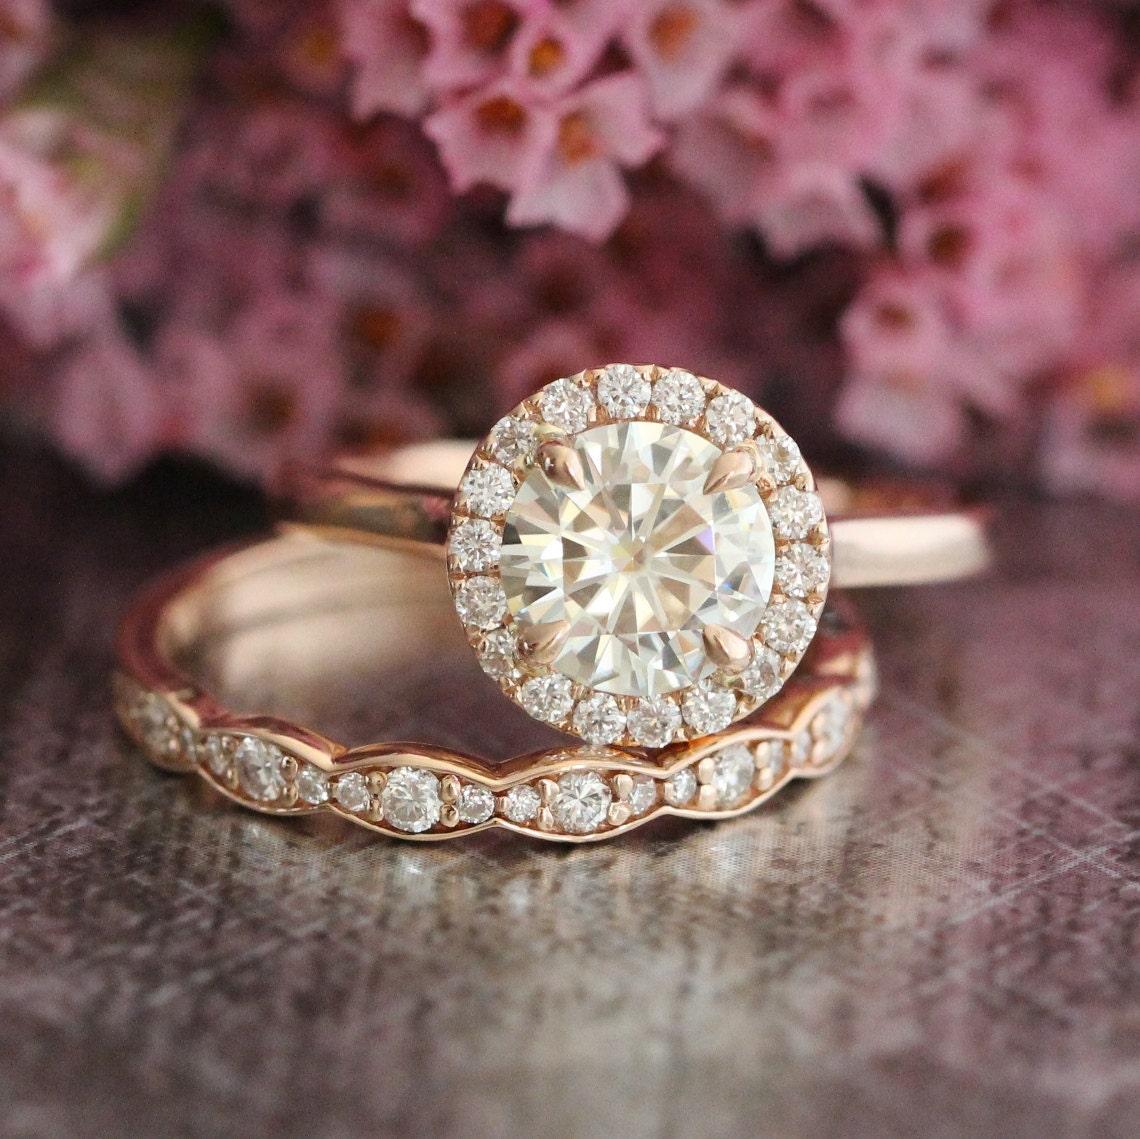 Rose Gold Moissanite Wedding Set Halo Engagement Ring and